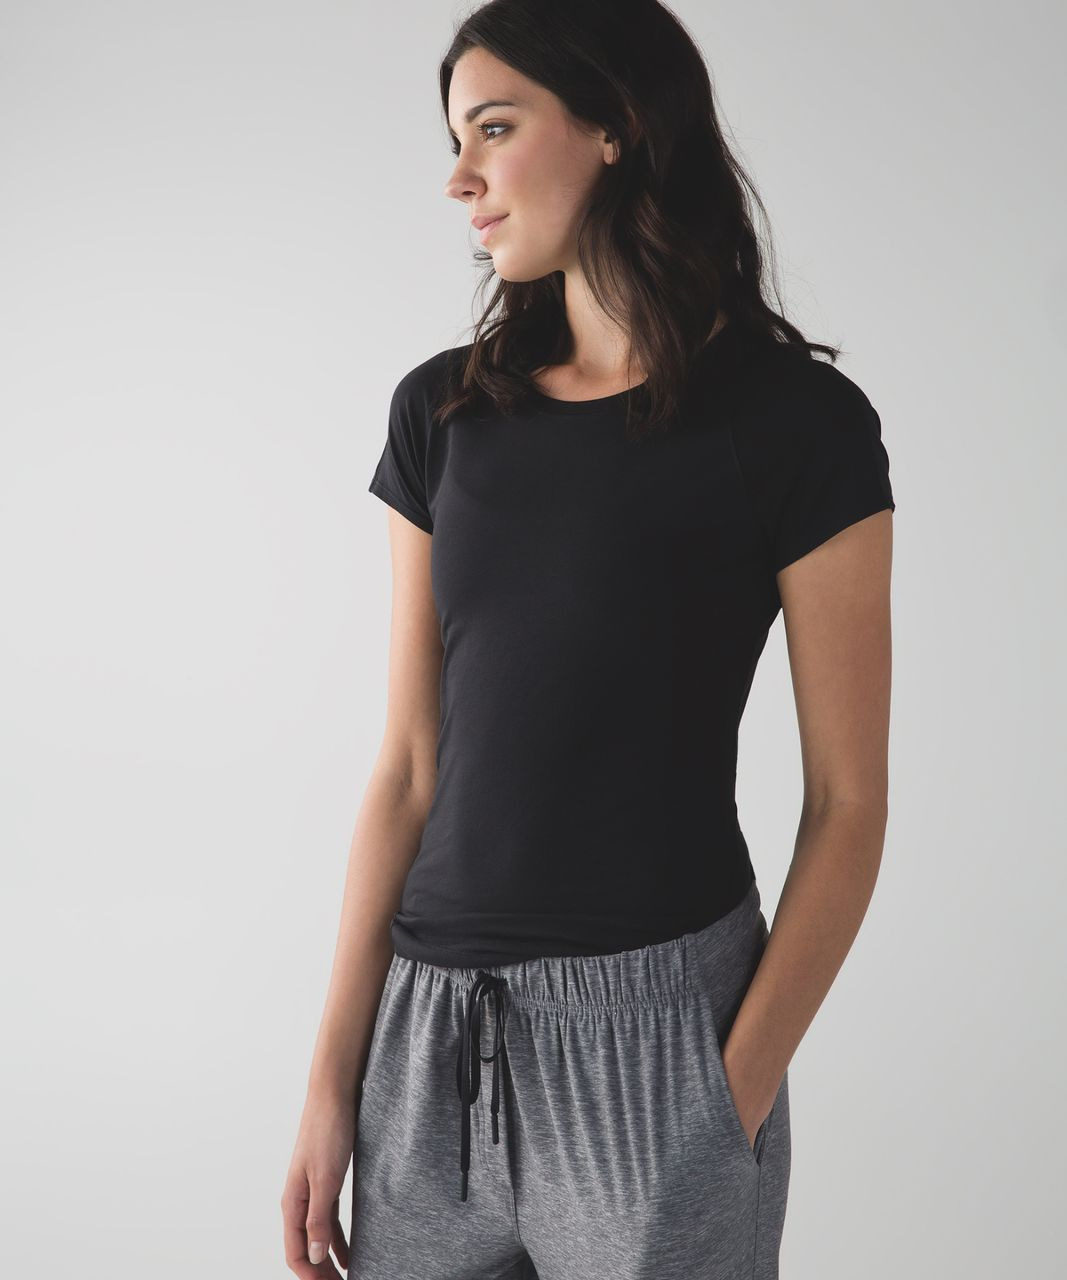 Lululemon Let Be Short Sleeve Tee - Black